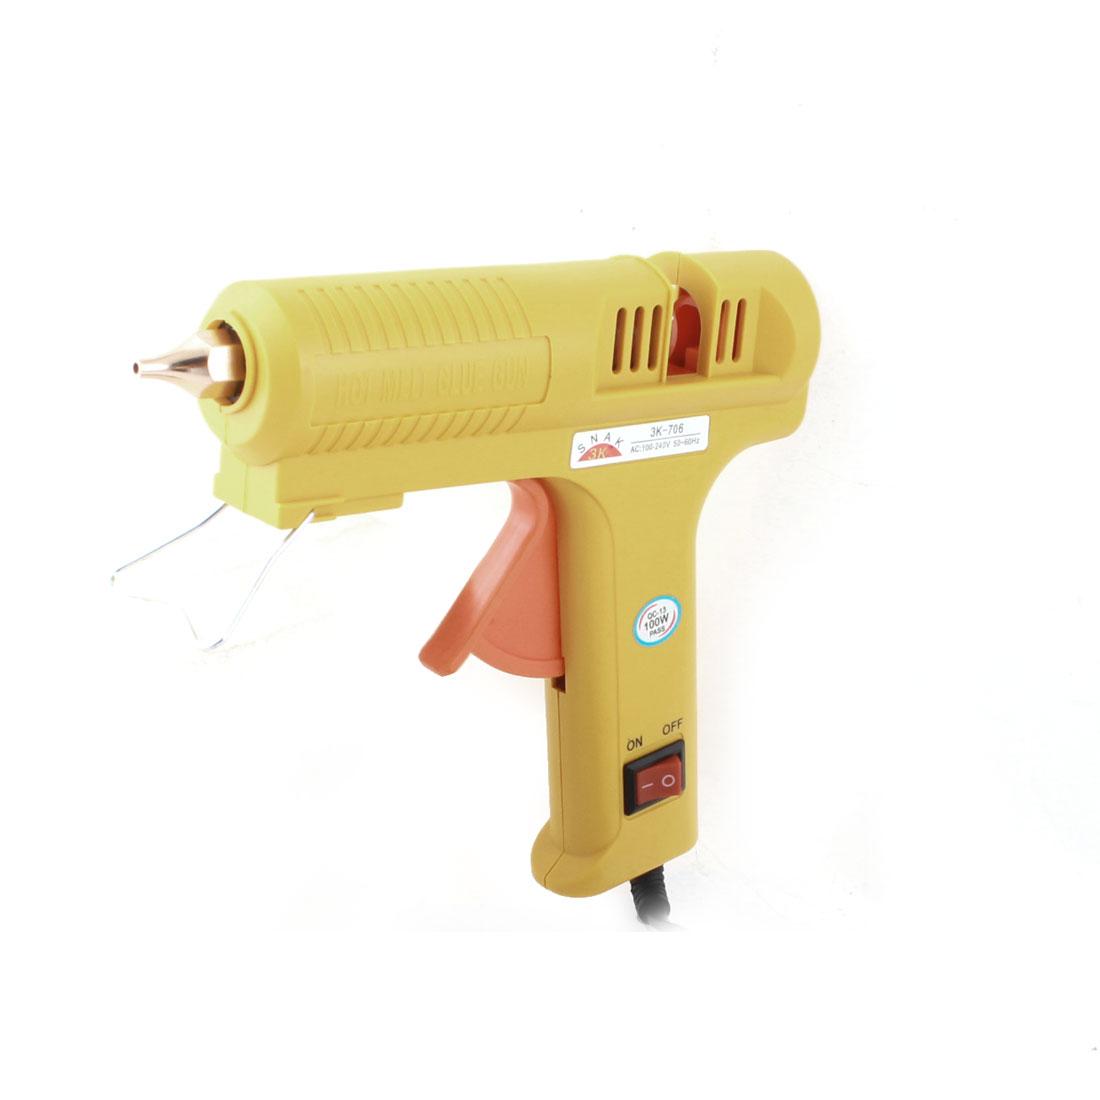 AC 100-240V US Plug Art Crafts Triggered Hot Melt Glue Gun 100W 3K-706